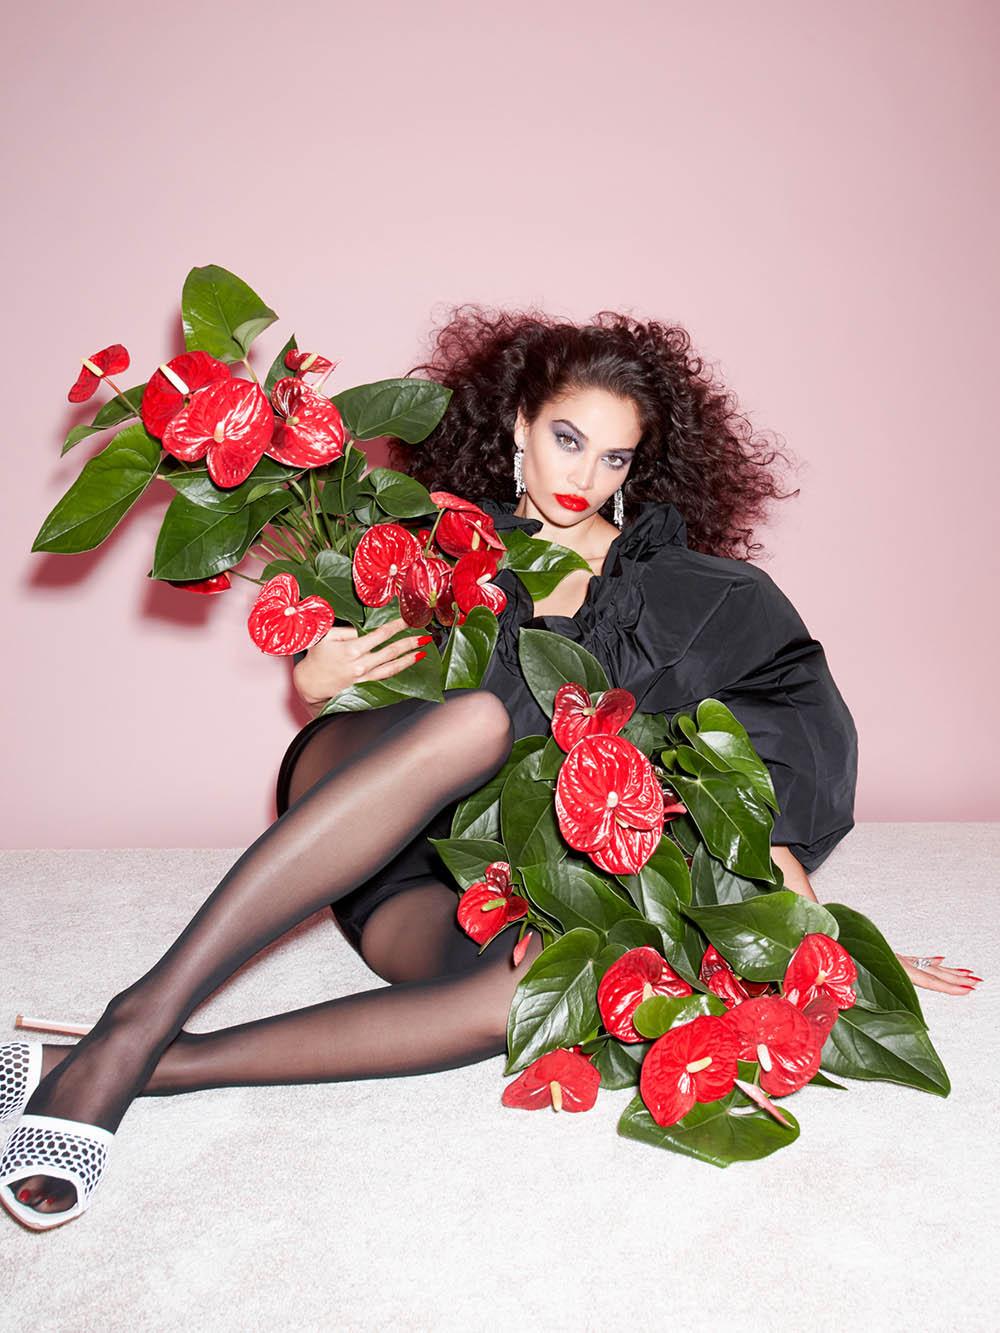 Shanina Shaik covers Harper's Bazaar Singapore January 2021 by Claire Rothstein